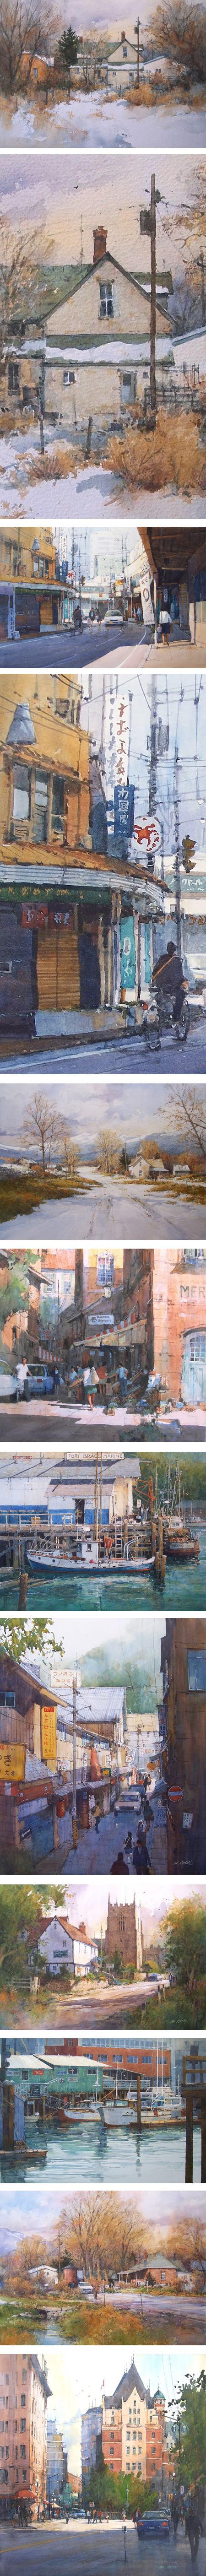 Ian Ramsay, watercolor